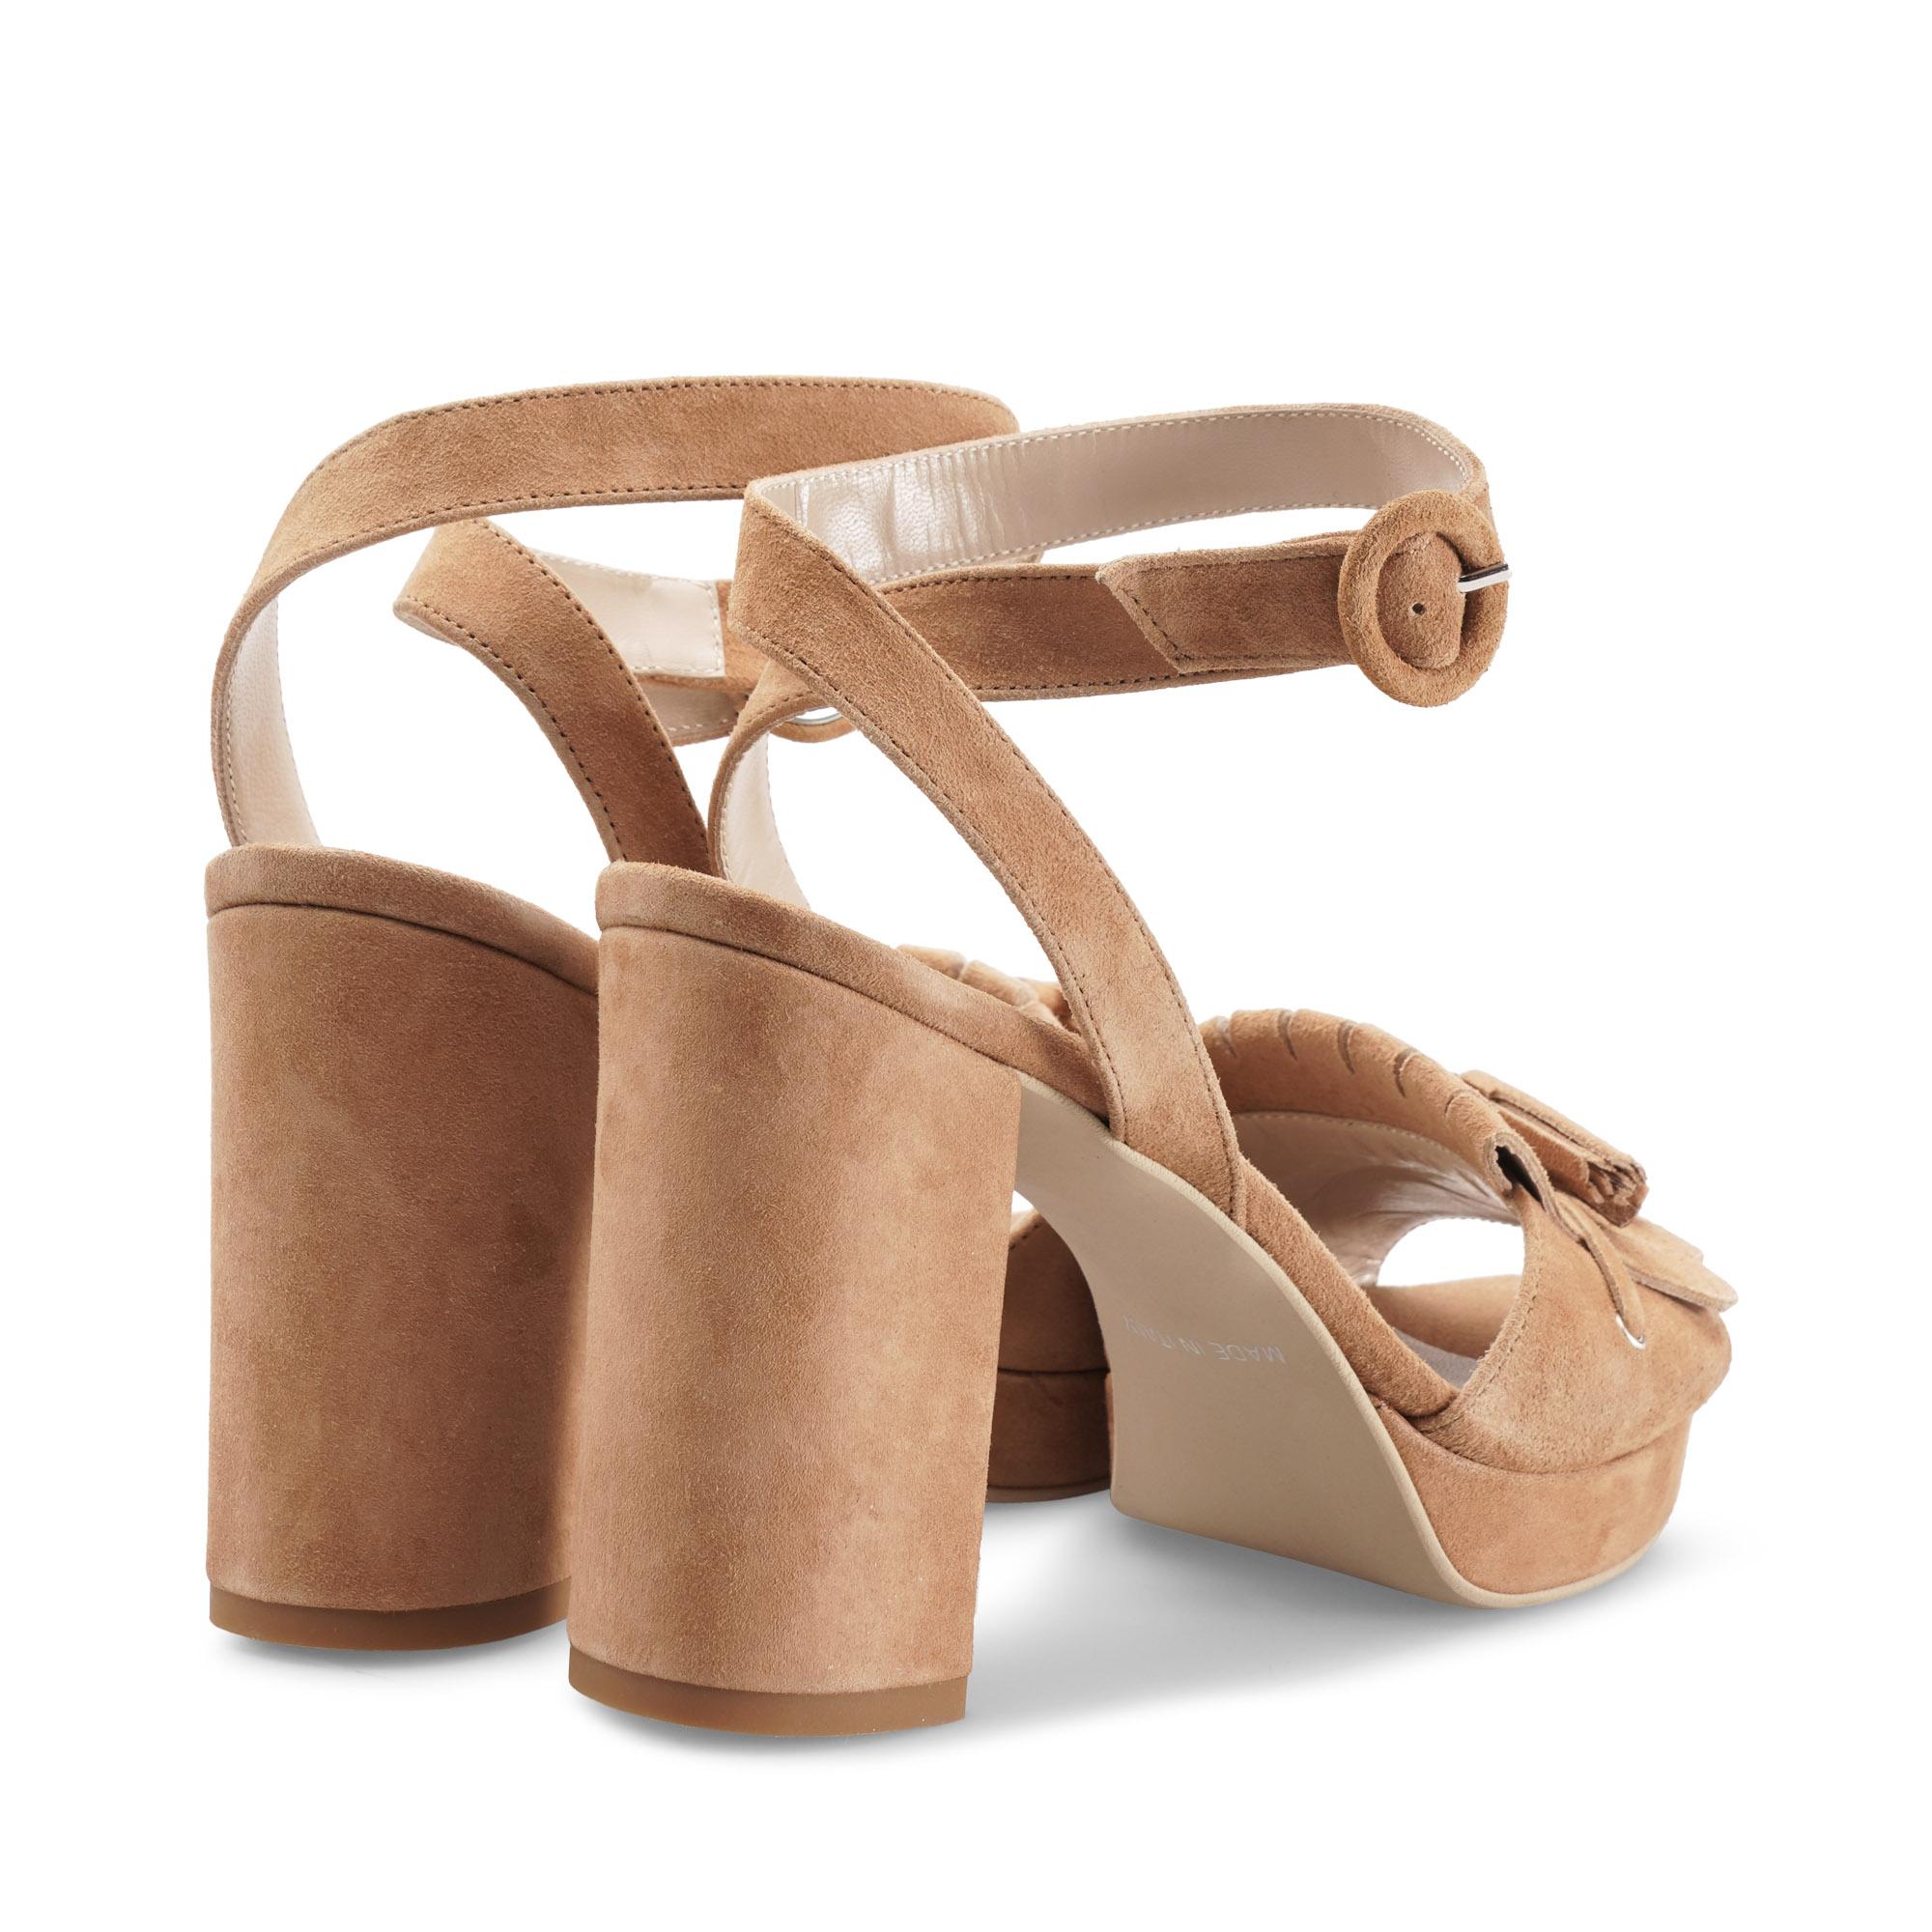 sandalo-donna-camoscio-cuoio-marrone-nappe-emanuela-passeri-heels-shoes-piantina-plateau-spring-summer-2021